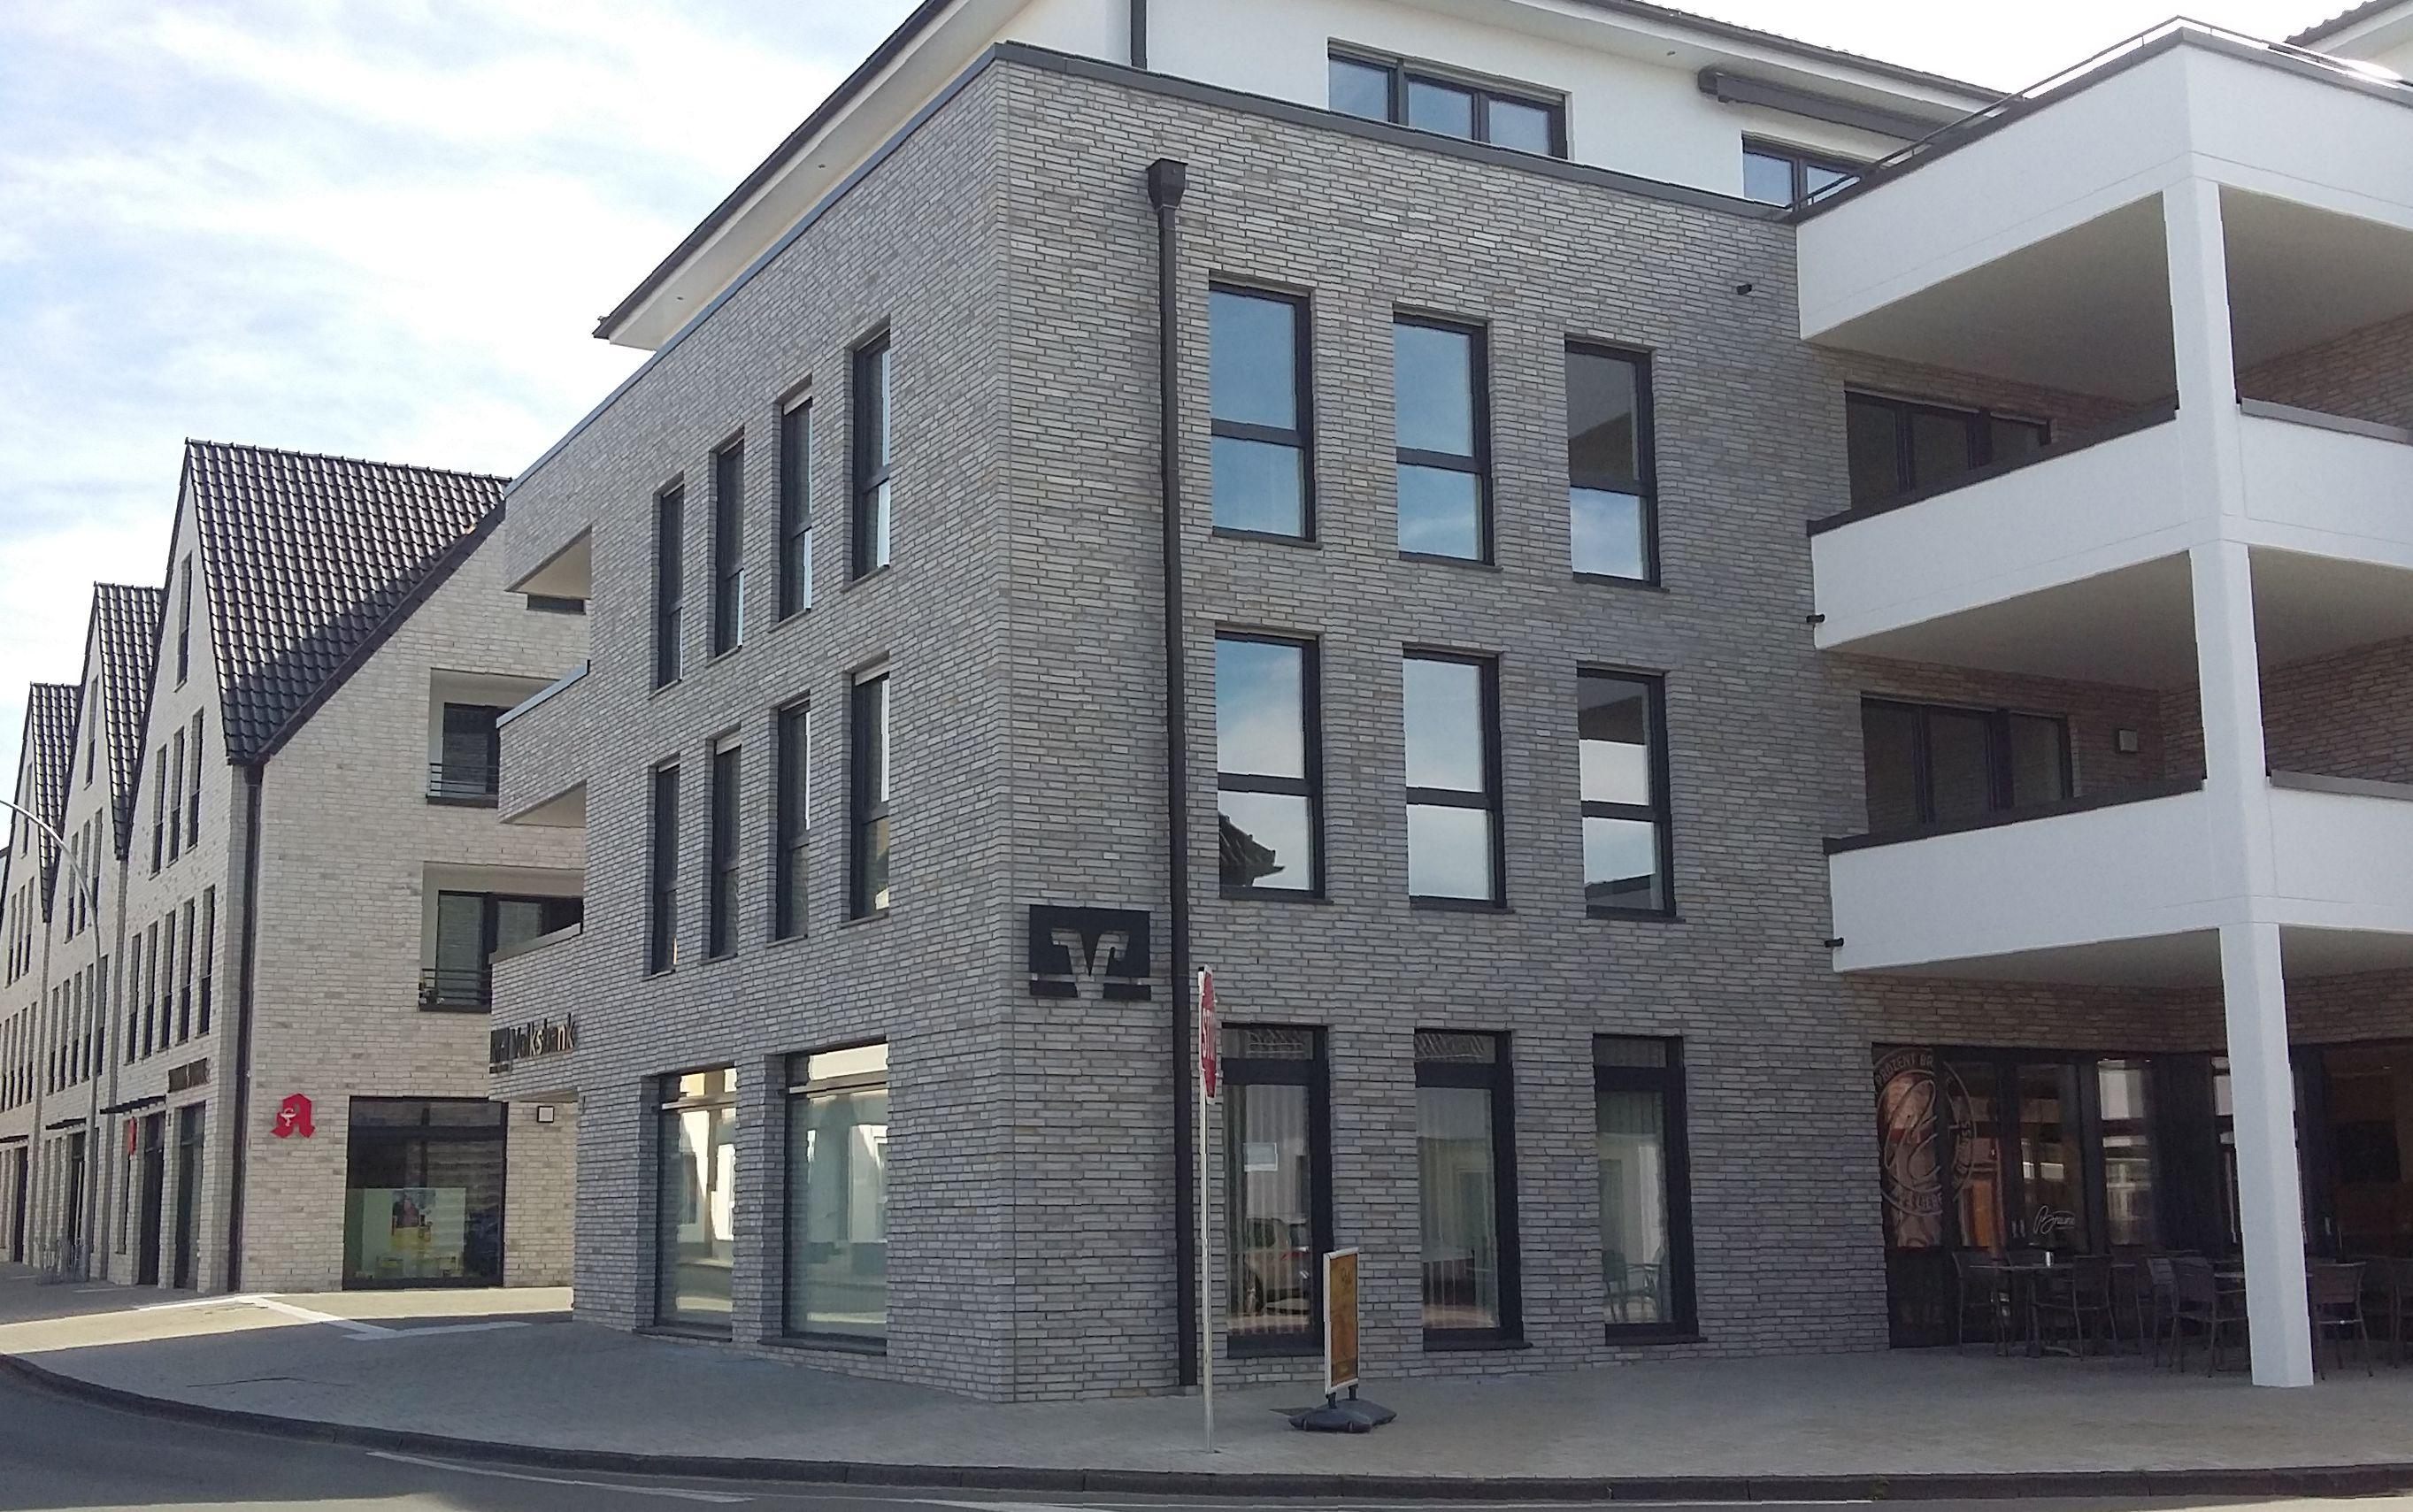 Volksbank Selm-Bork eG Volksbank Altlünen, Volksbank Selm-Bork eG Volksbank Altlünen, Waltroper Straße 1, 59379, Selm